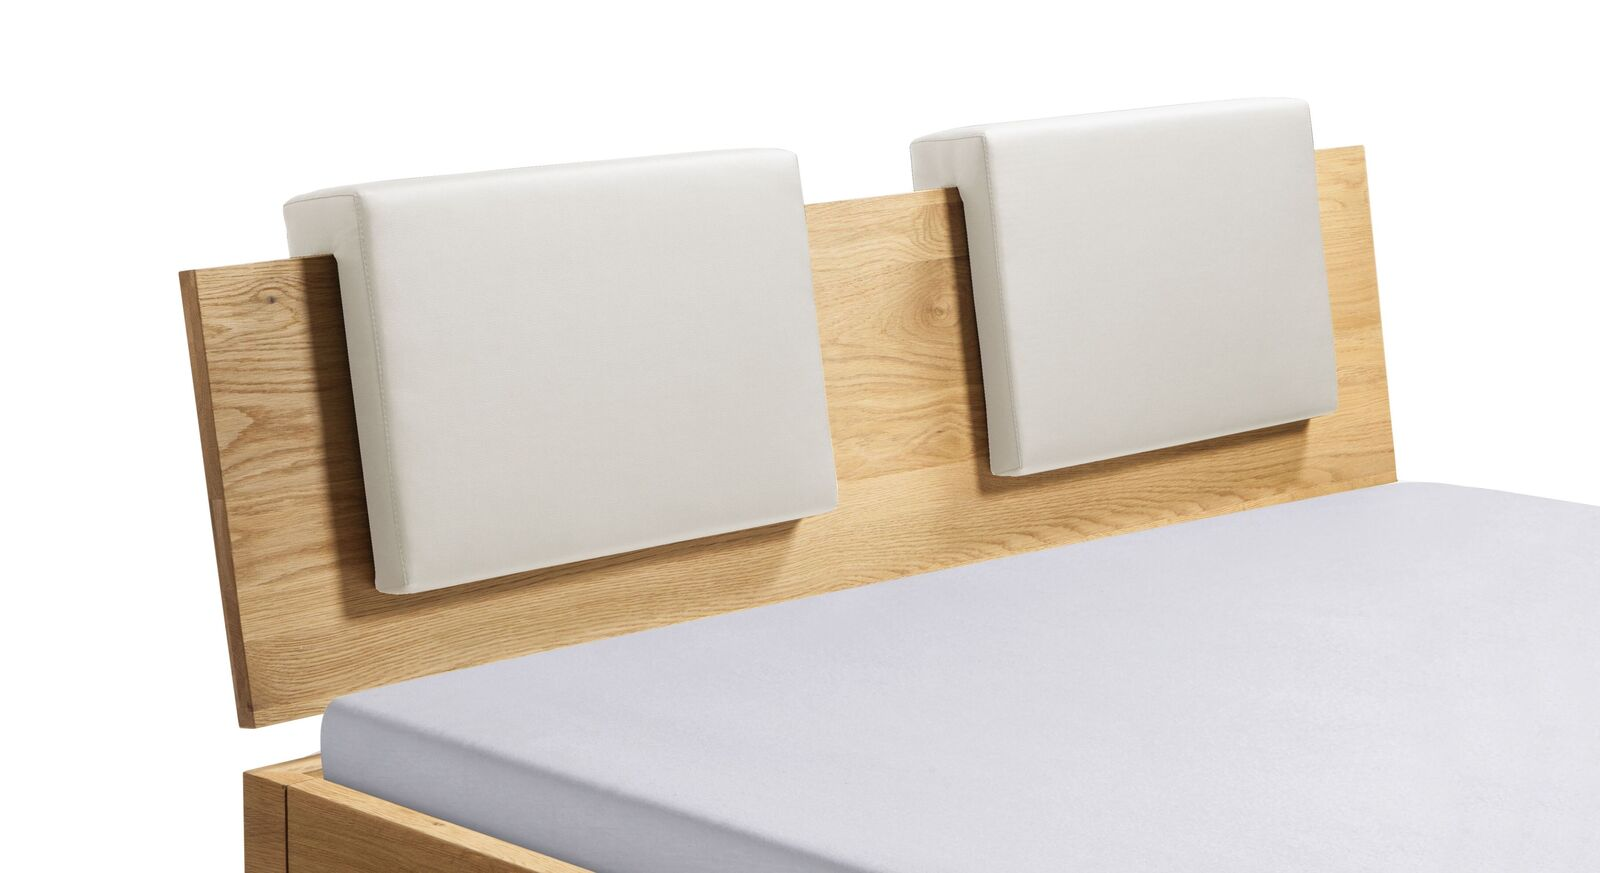 Einsteck-Kissen Rimini mit Kunstlederbezug in Weiß